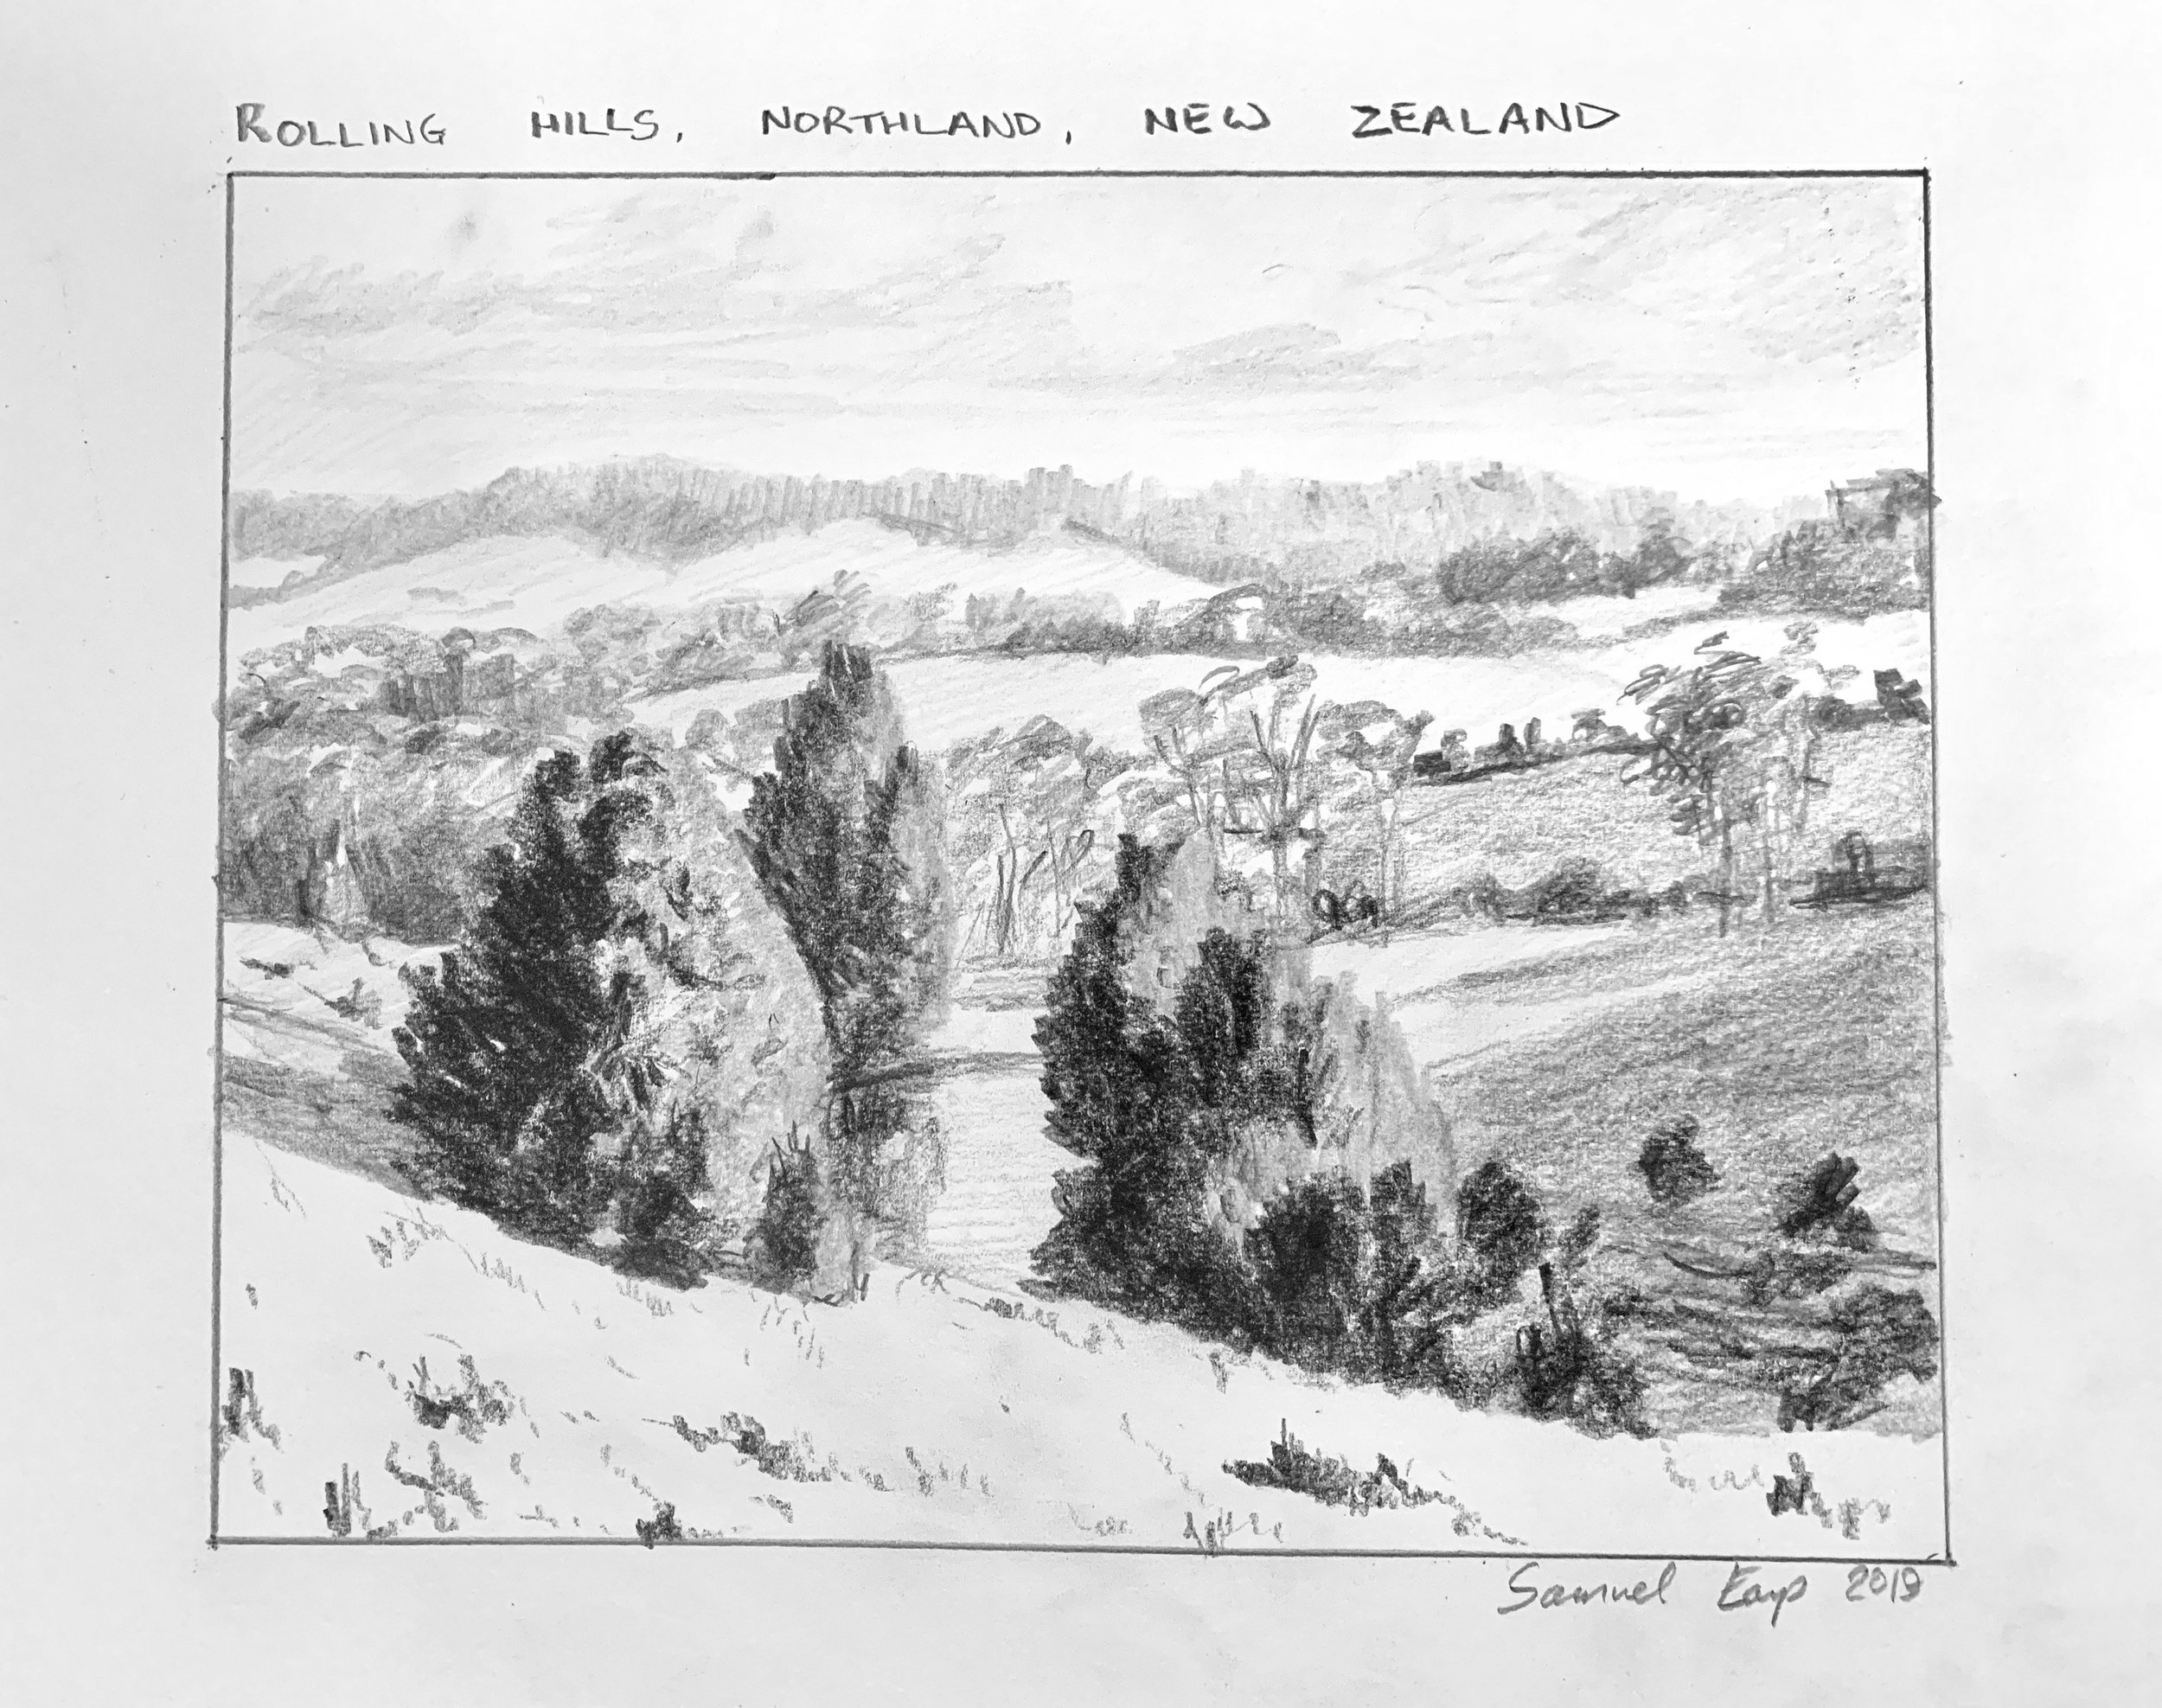 Rolling Hills Northalnd - pencil drawing - Samuel Earp.jpeg